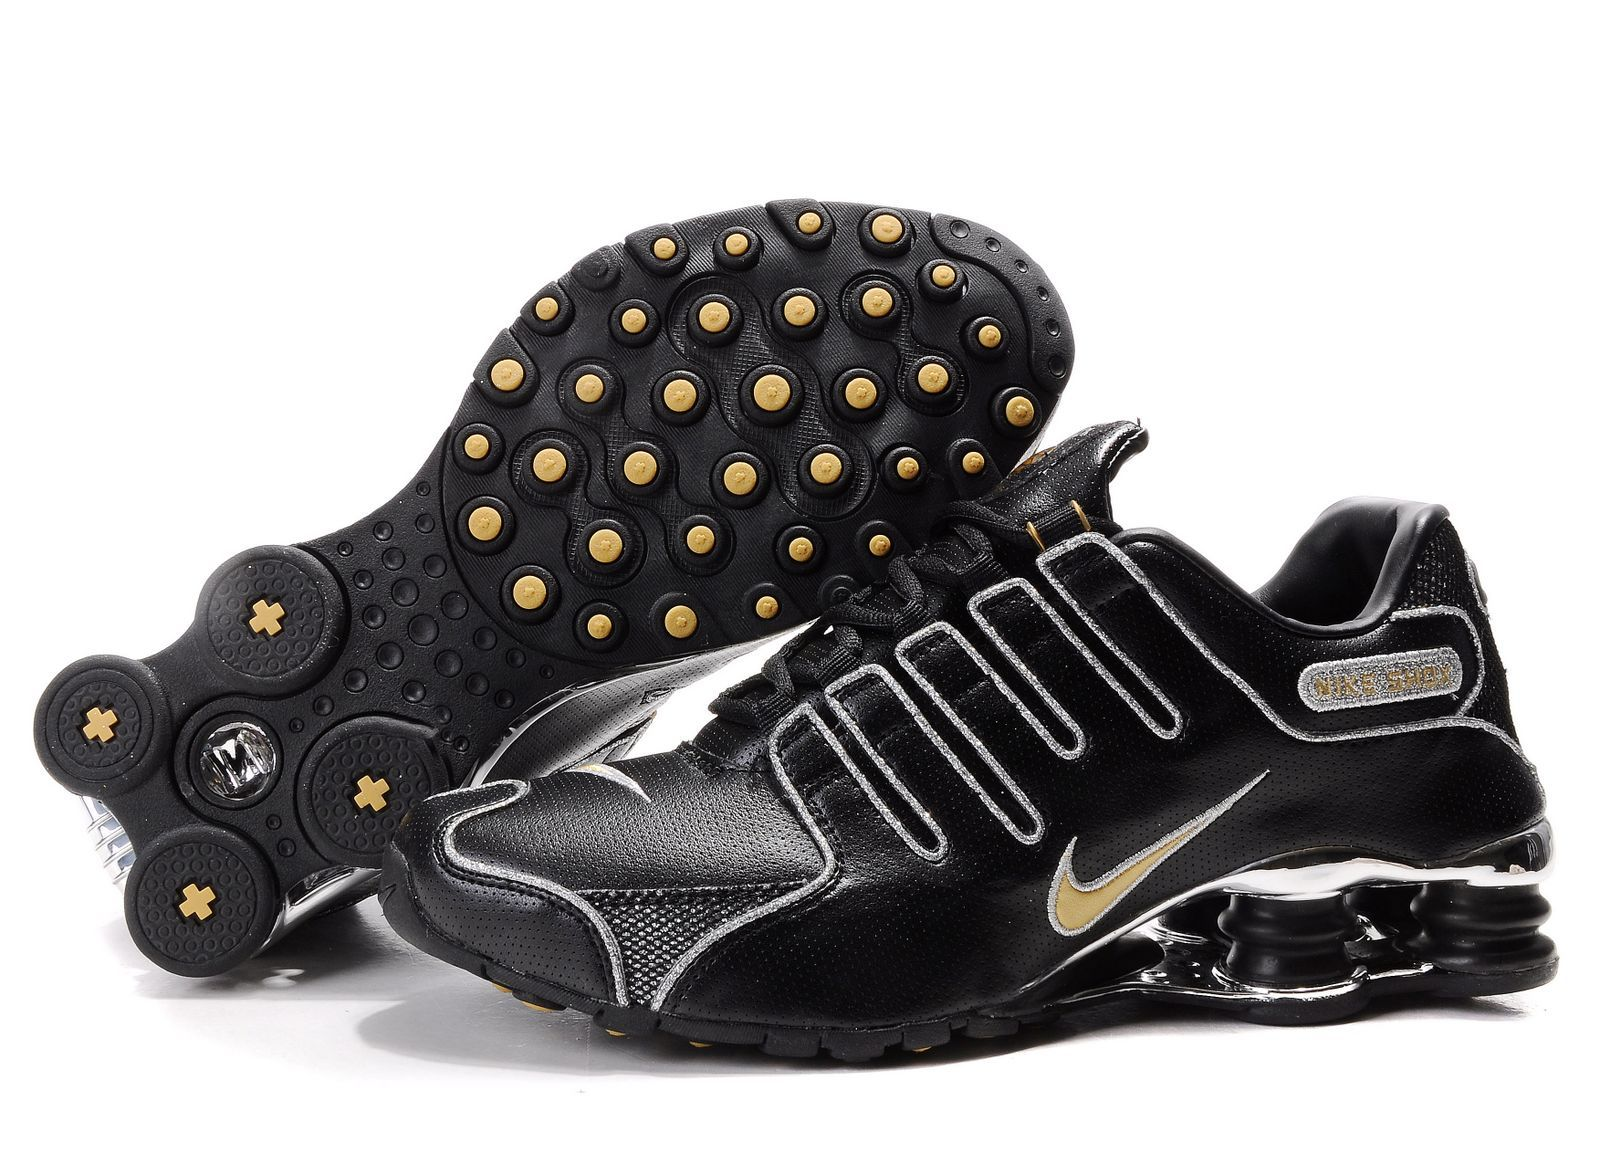 huge selection of 0a2be 35cb8 Mens Nike Shox NZ Running Sneaker Black Gold